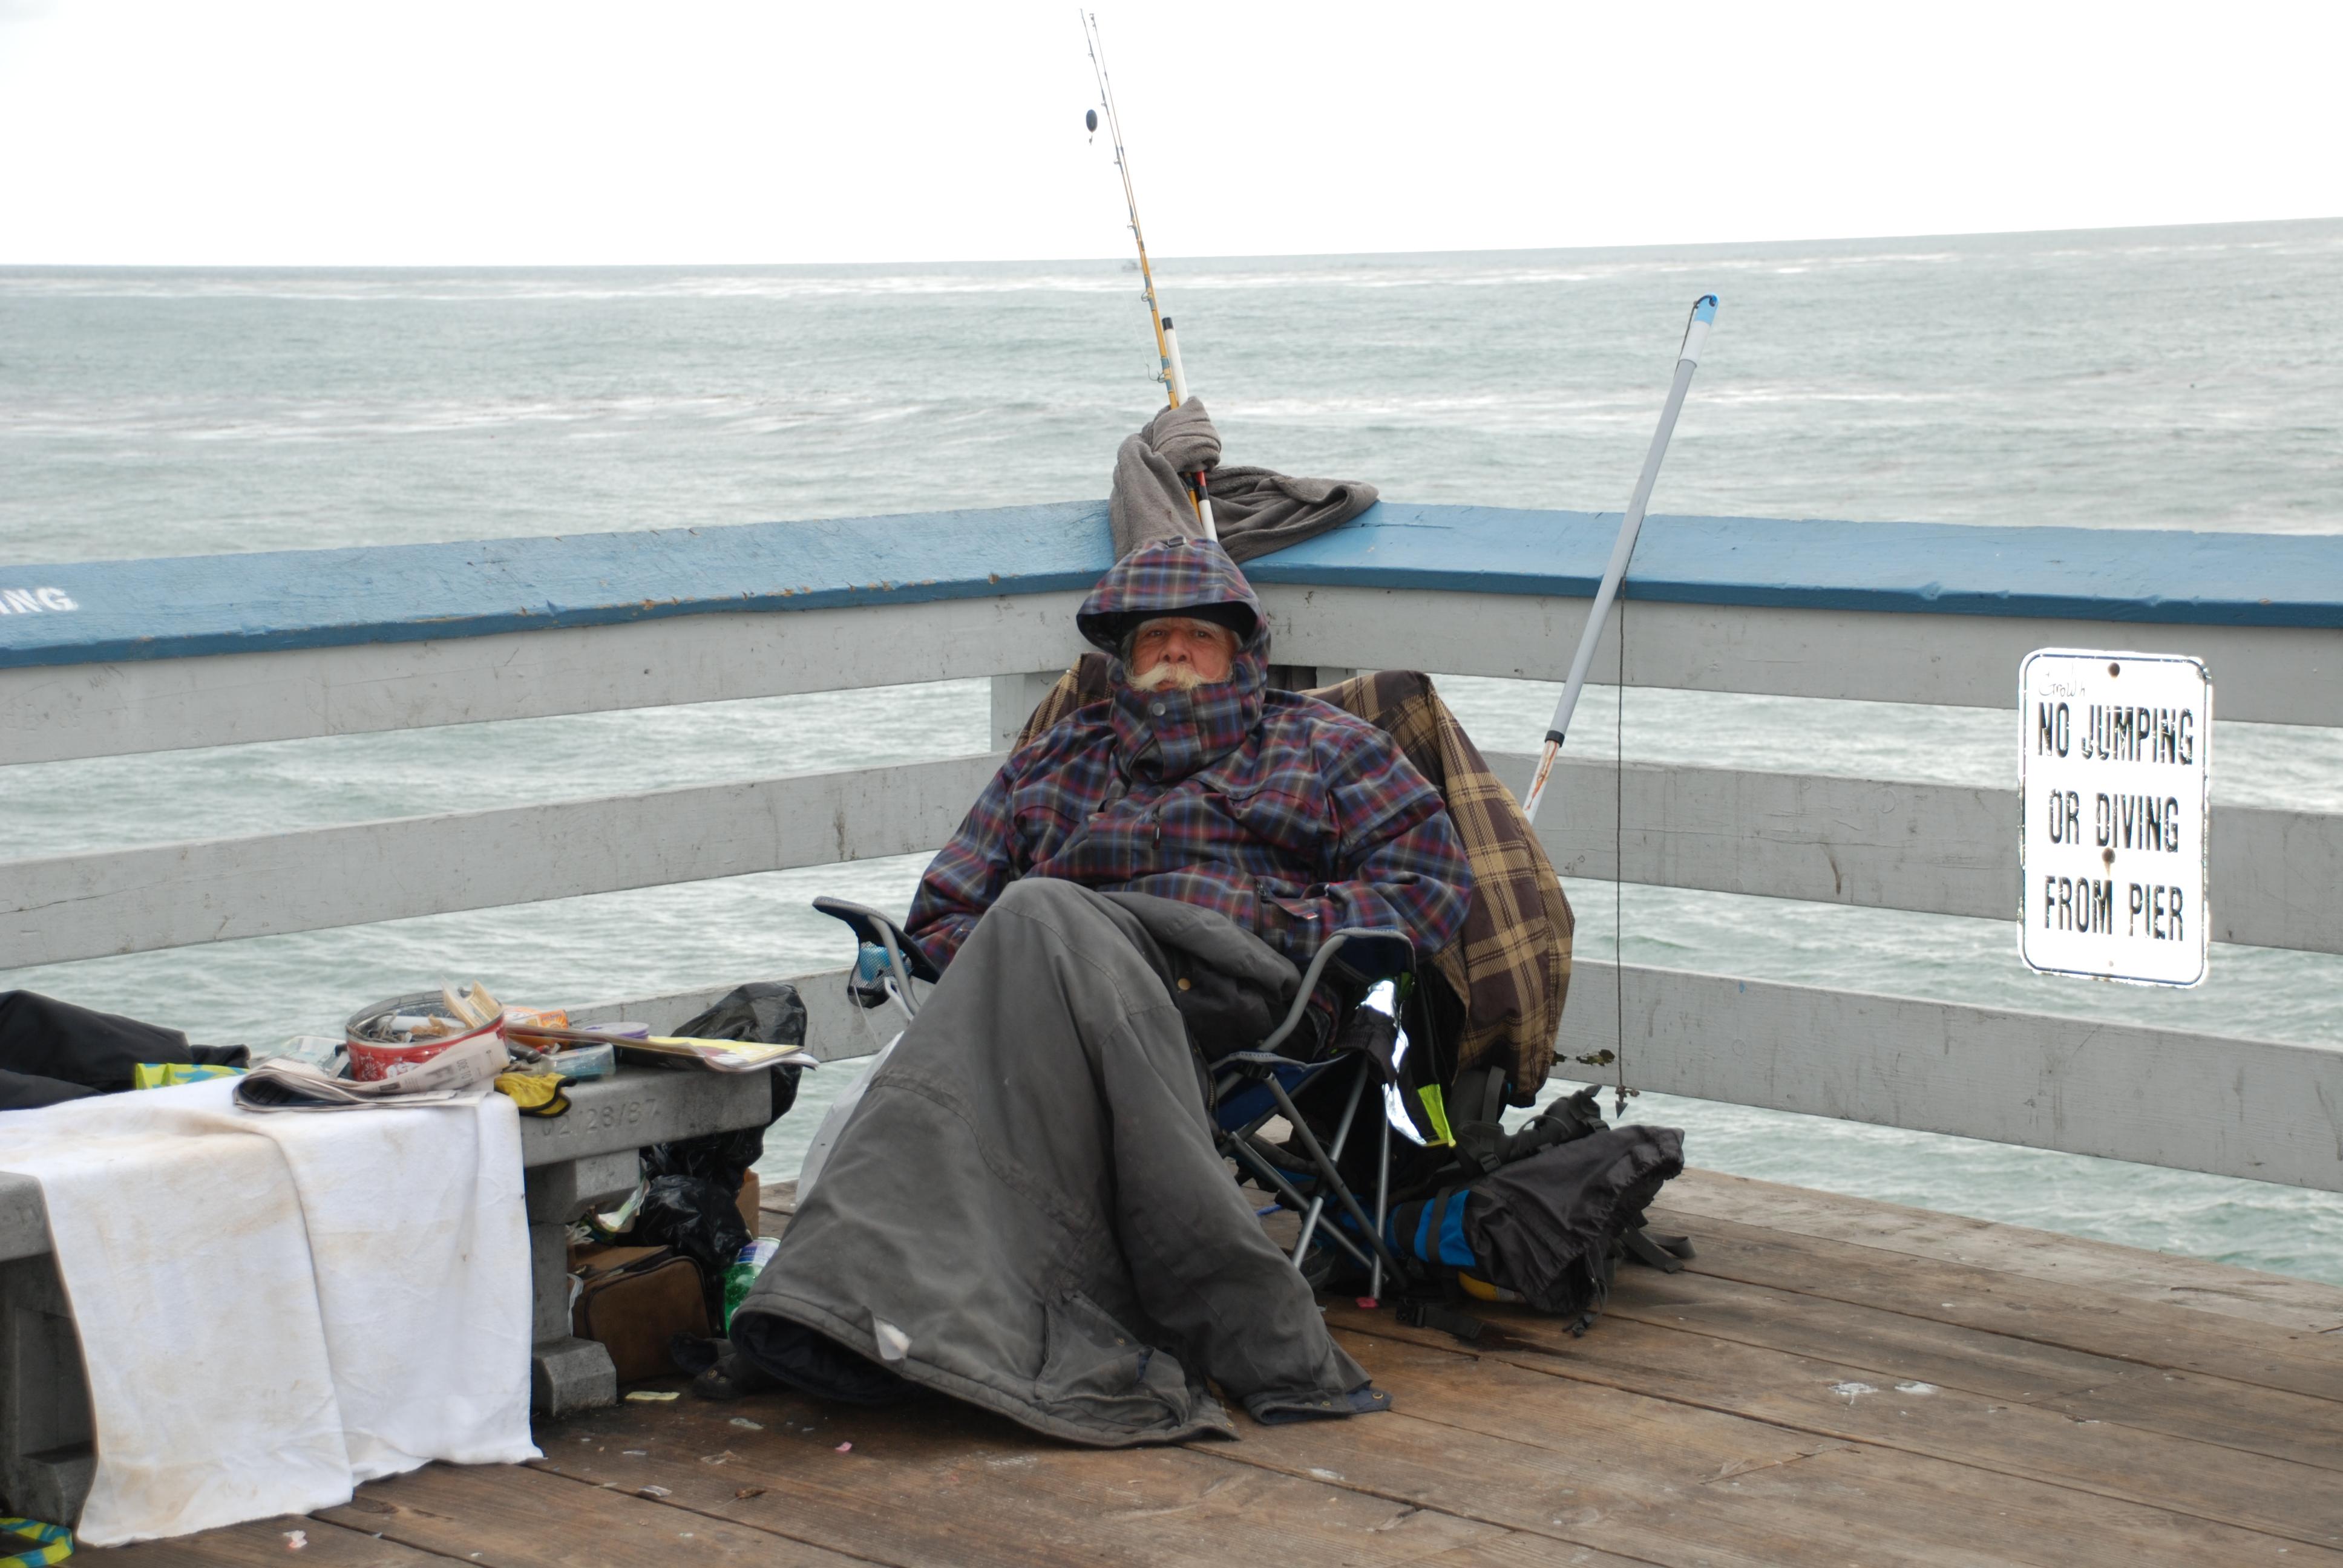 Southern california beaches san clemente little usa trips for Pier fishing san diego